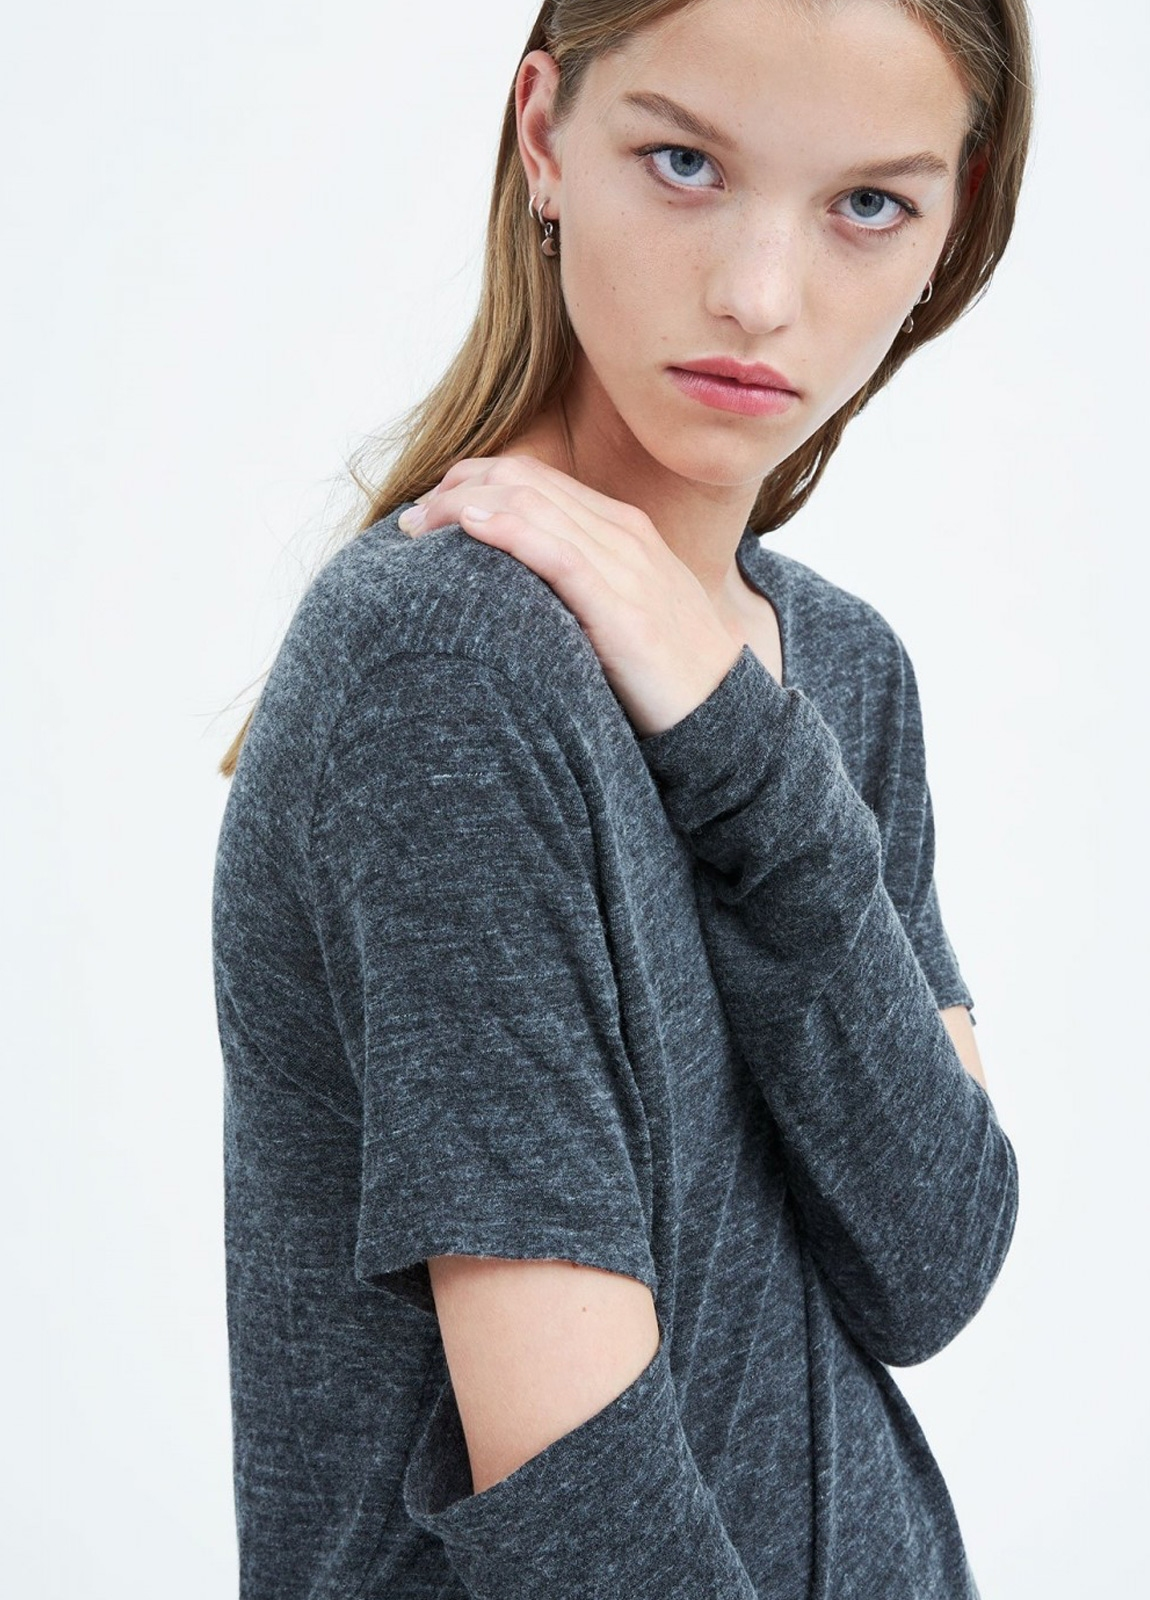 Camiseta woman manga larga color gris con abertura en codos. 63% Viscosa 28% Lana 9% Poliamida.